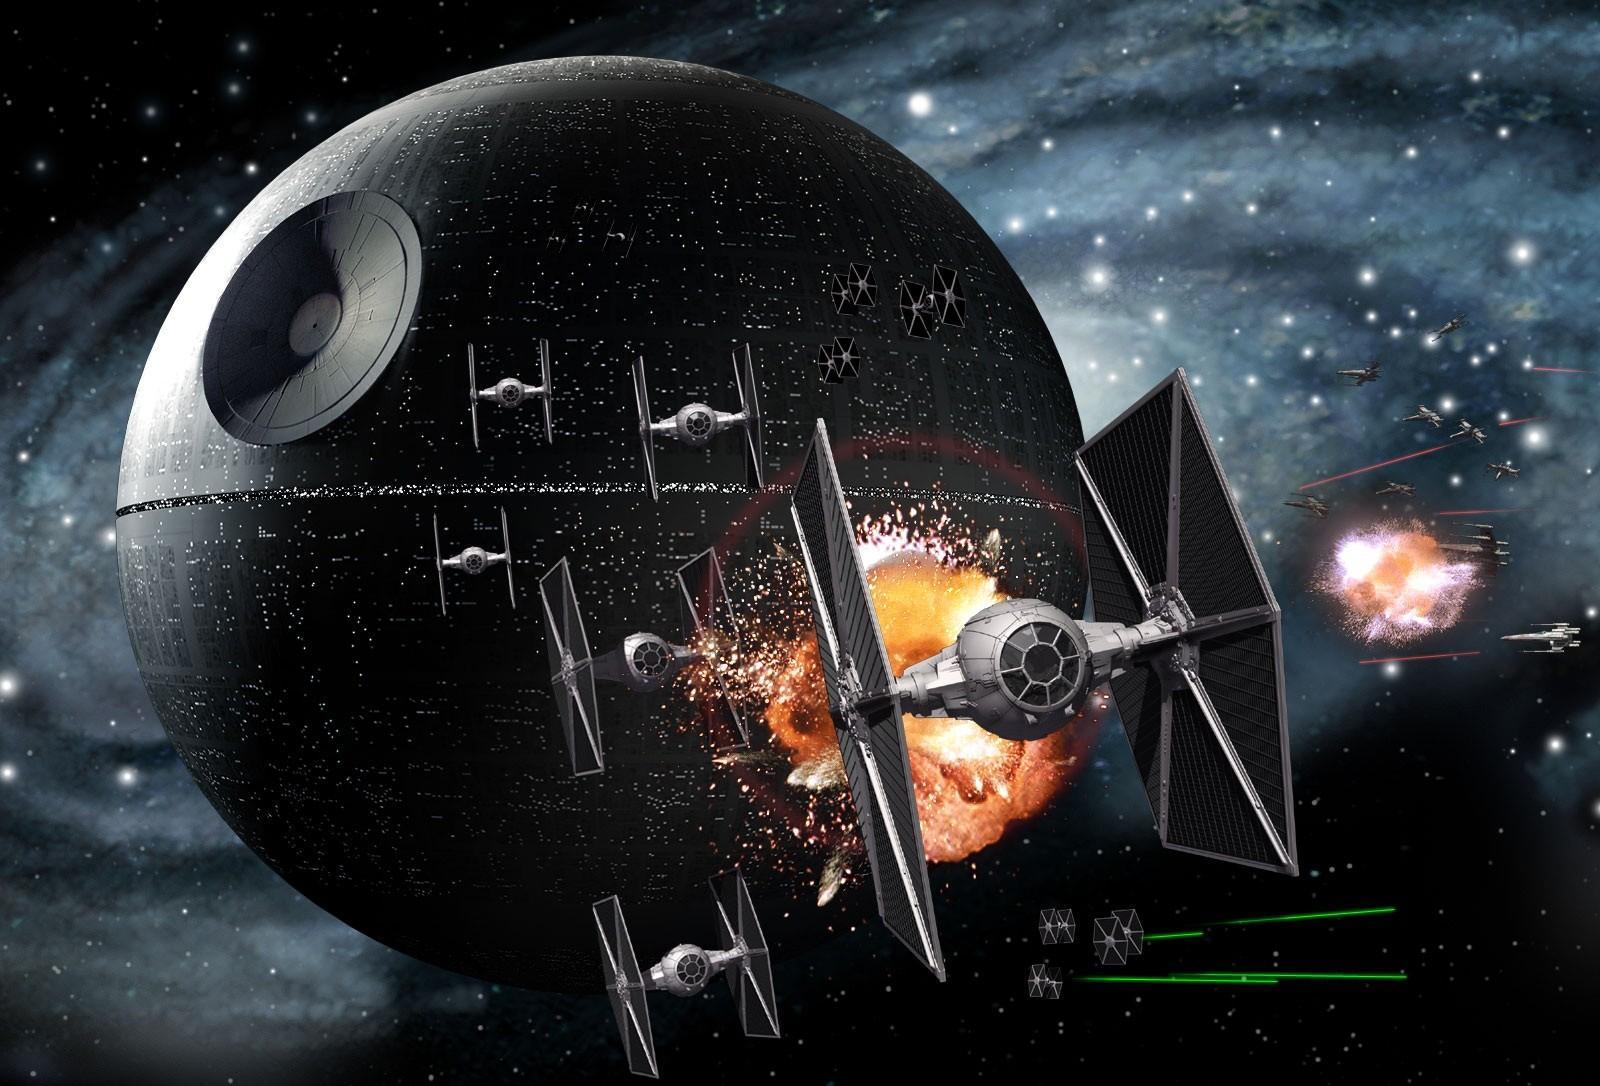 Hd Desktop Star Wars Wallpapers Wallpaper Cave